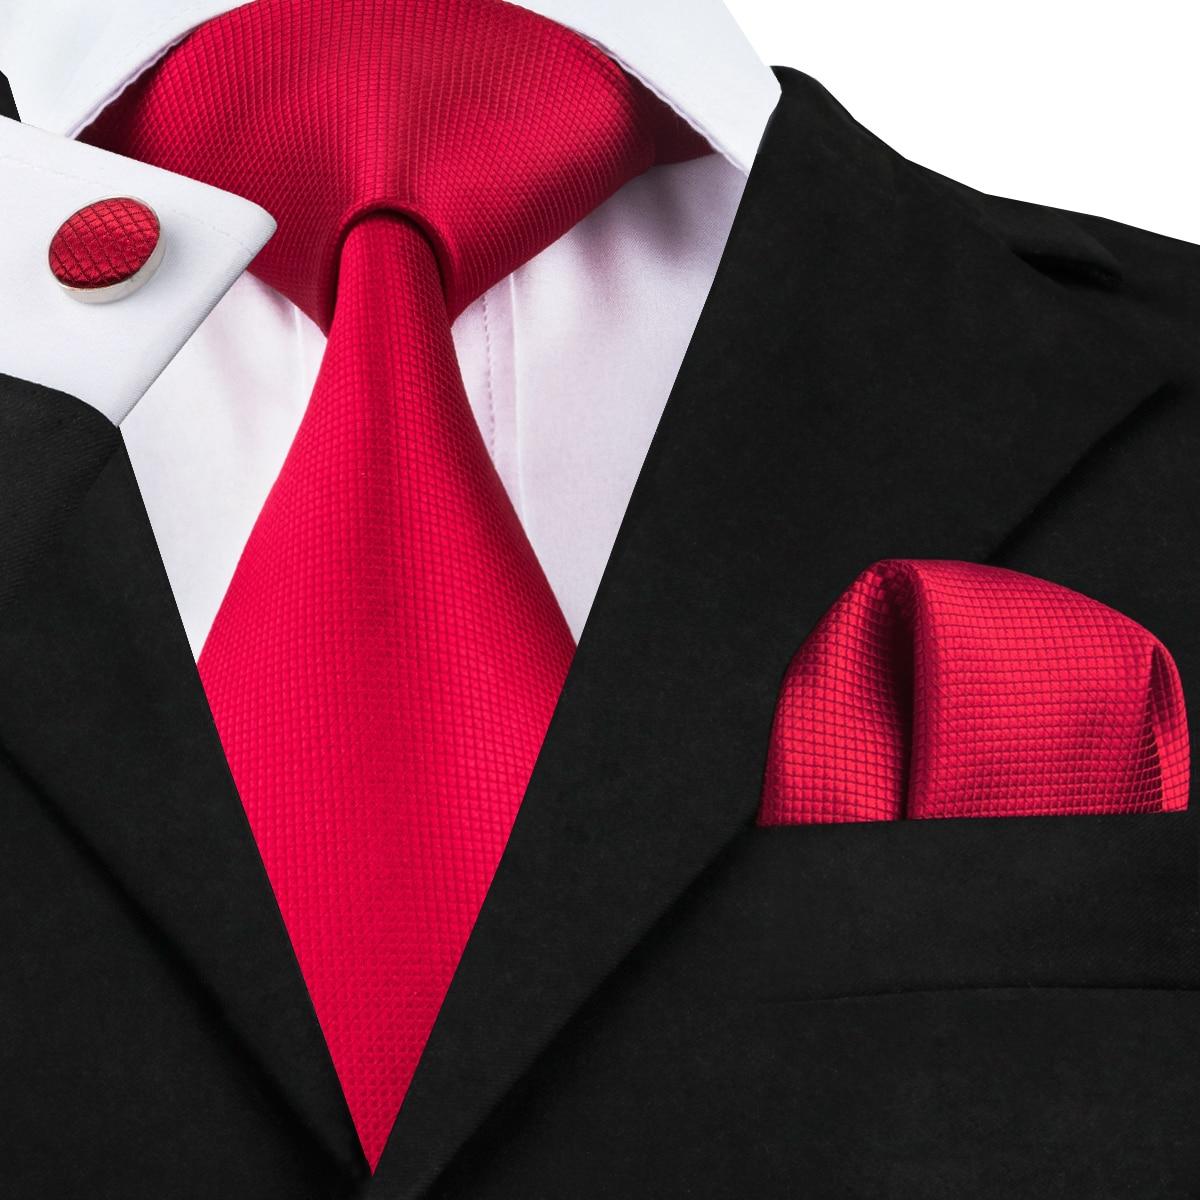 C-206 Hi-Tie Ties For Men Floral Pattern Tie Hanky Cufflinks Pocket Square 100% Silk 8.5cm Orange Green Purple